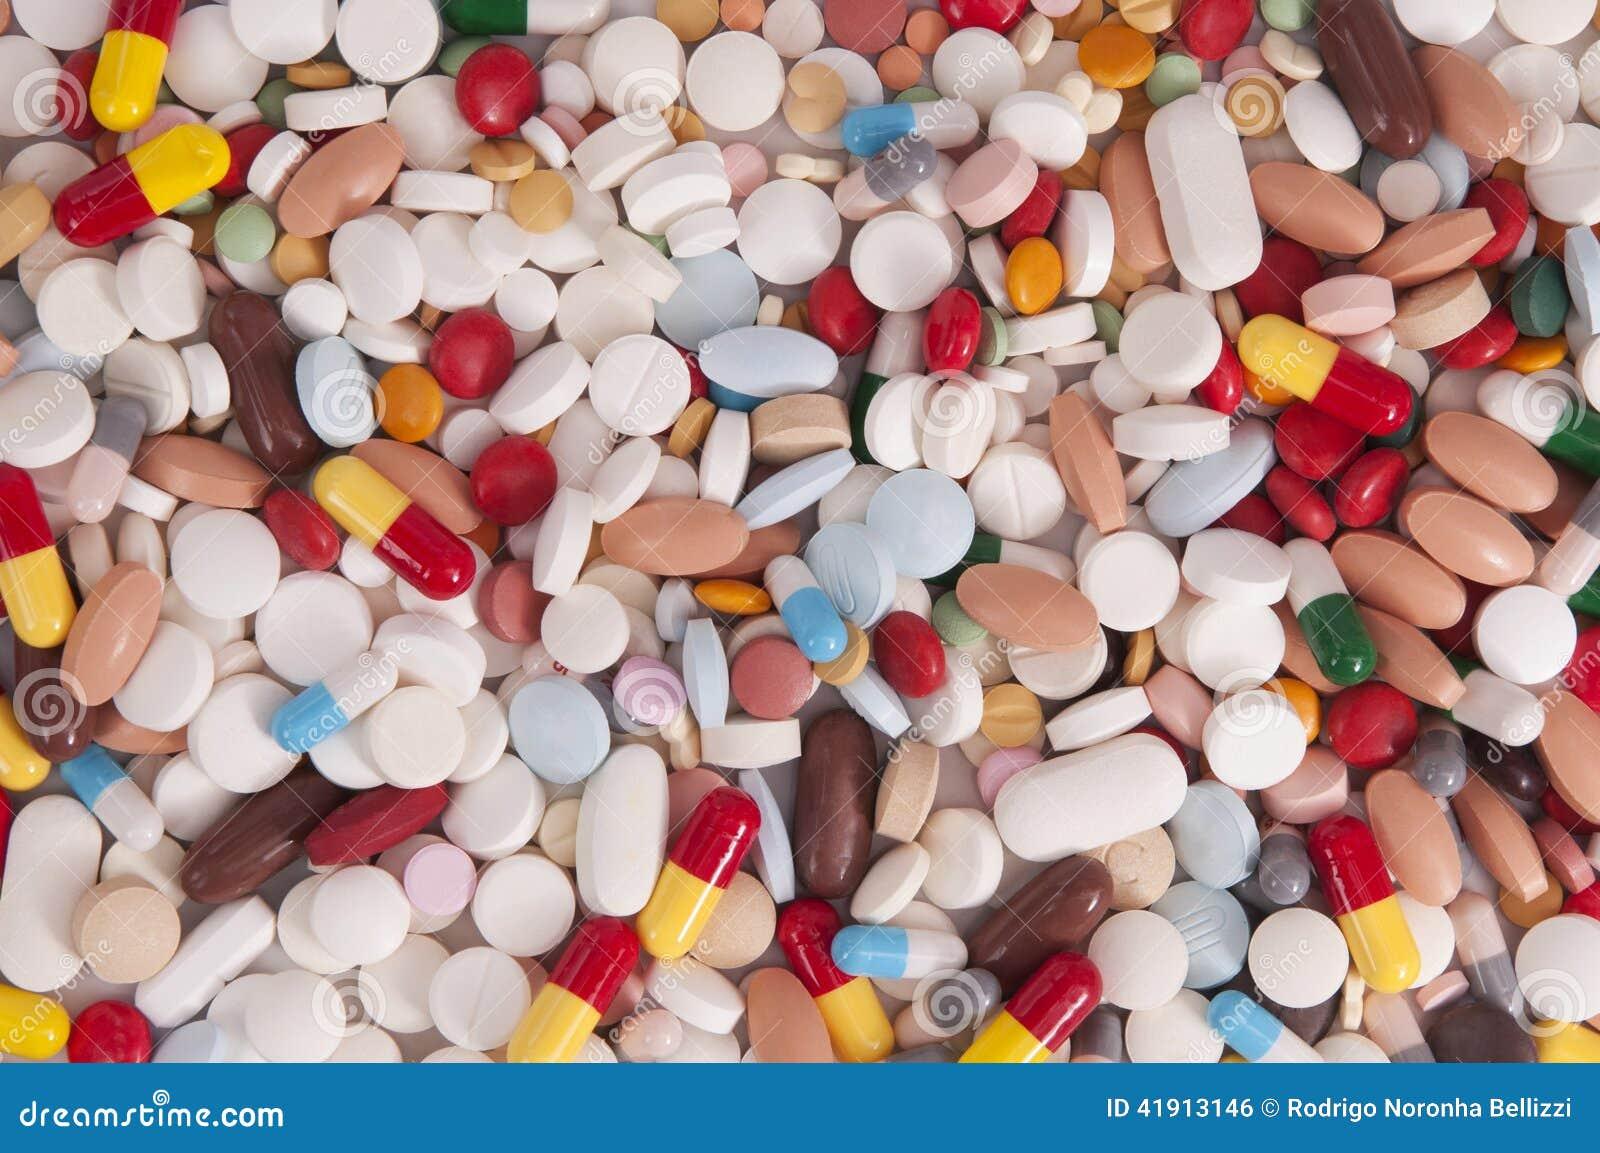 Cápsulas y píldoras